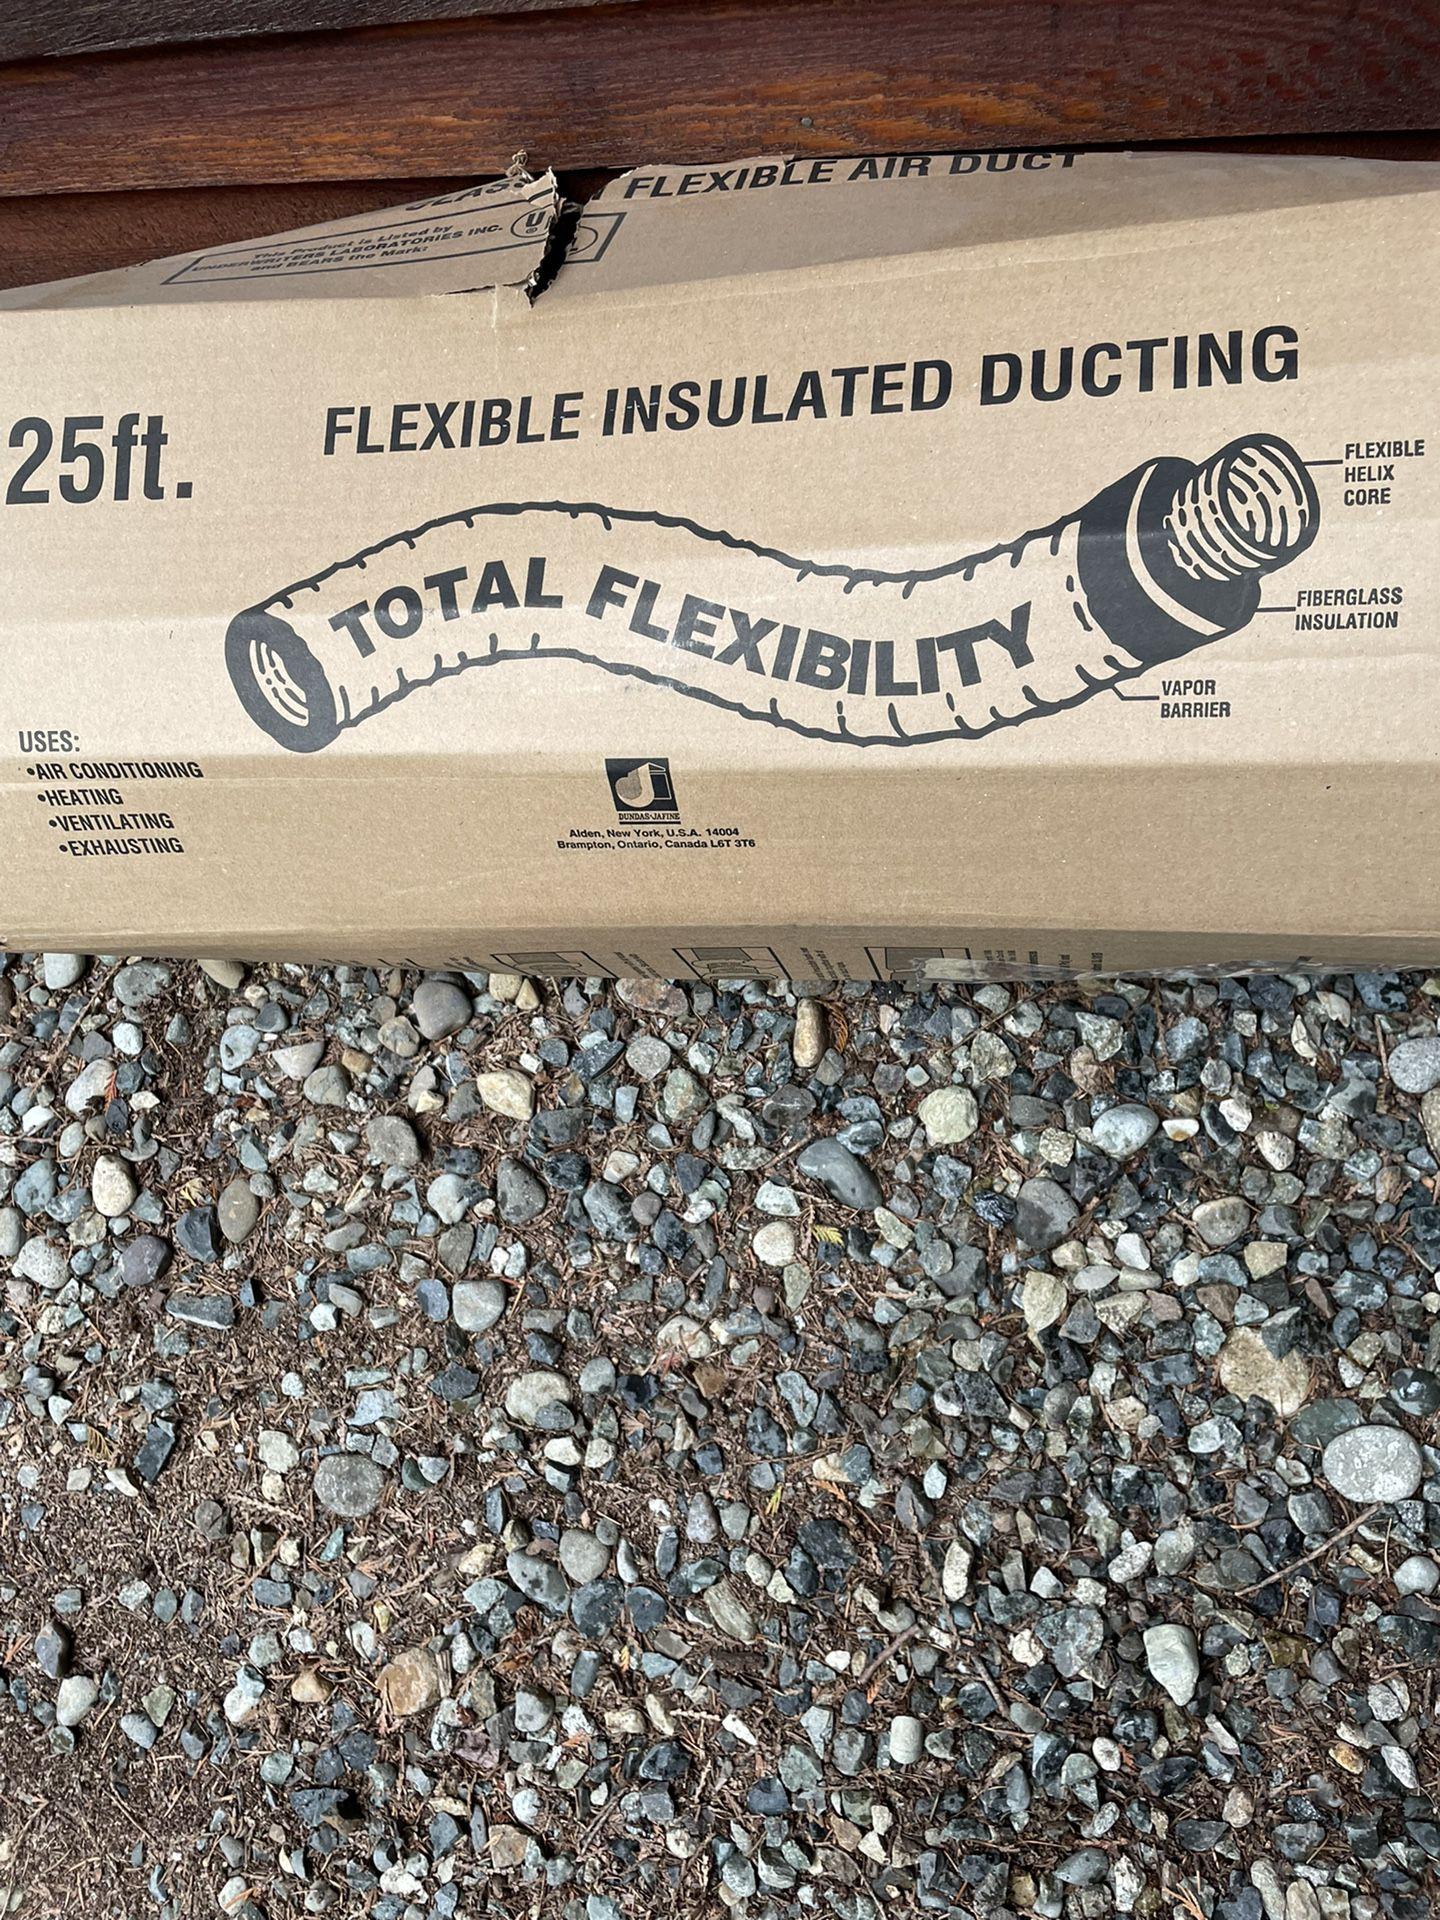 "Flexible Insulated Ducting - 20' Long 8"" Diameter"